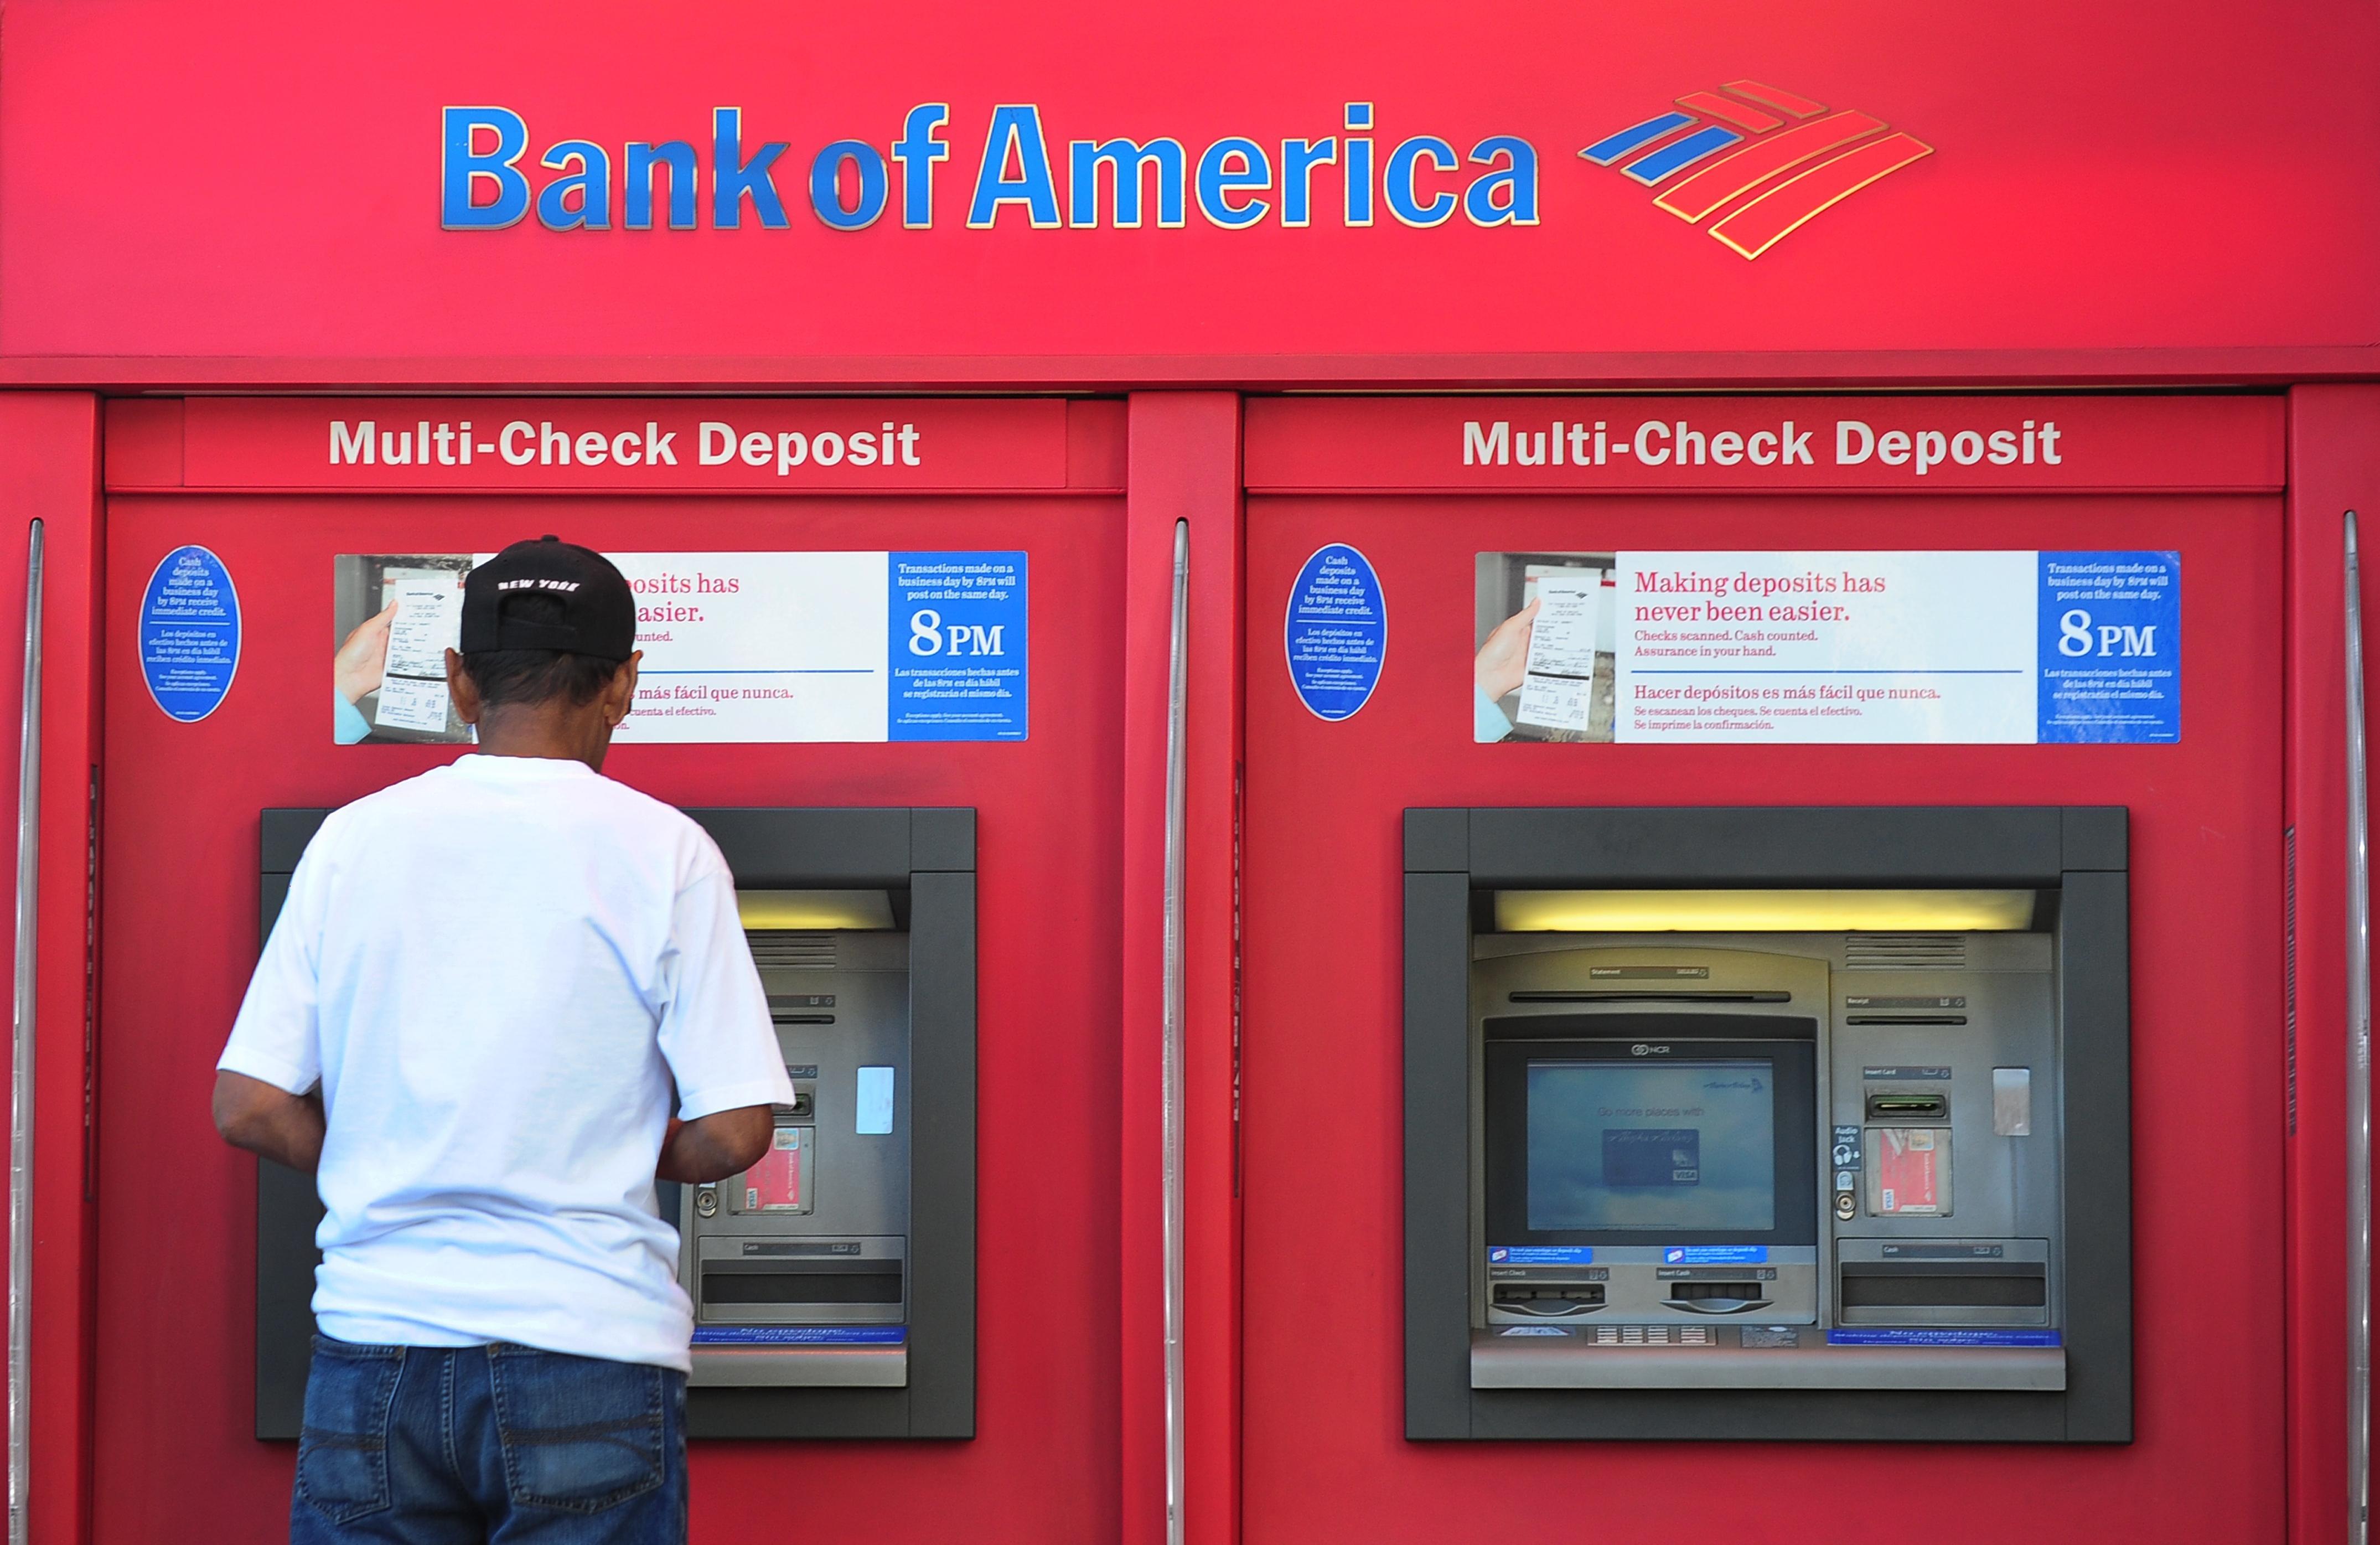 US-BANKING-HOUSING-FINANCE-BOFA-FRAUD